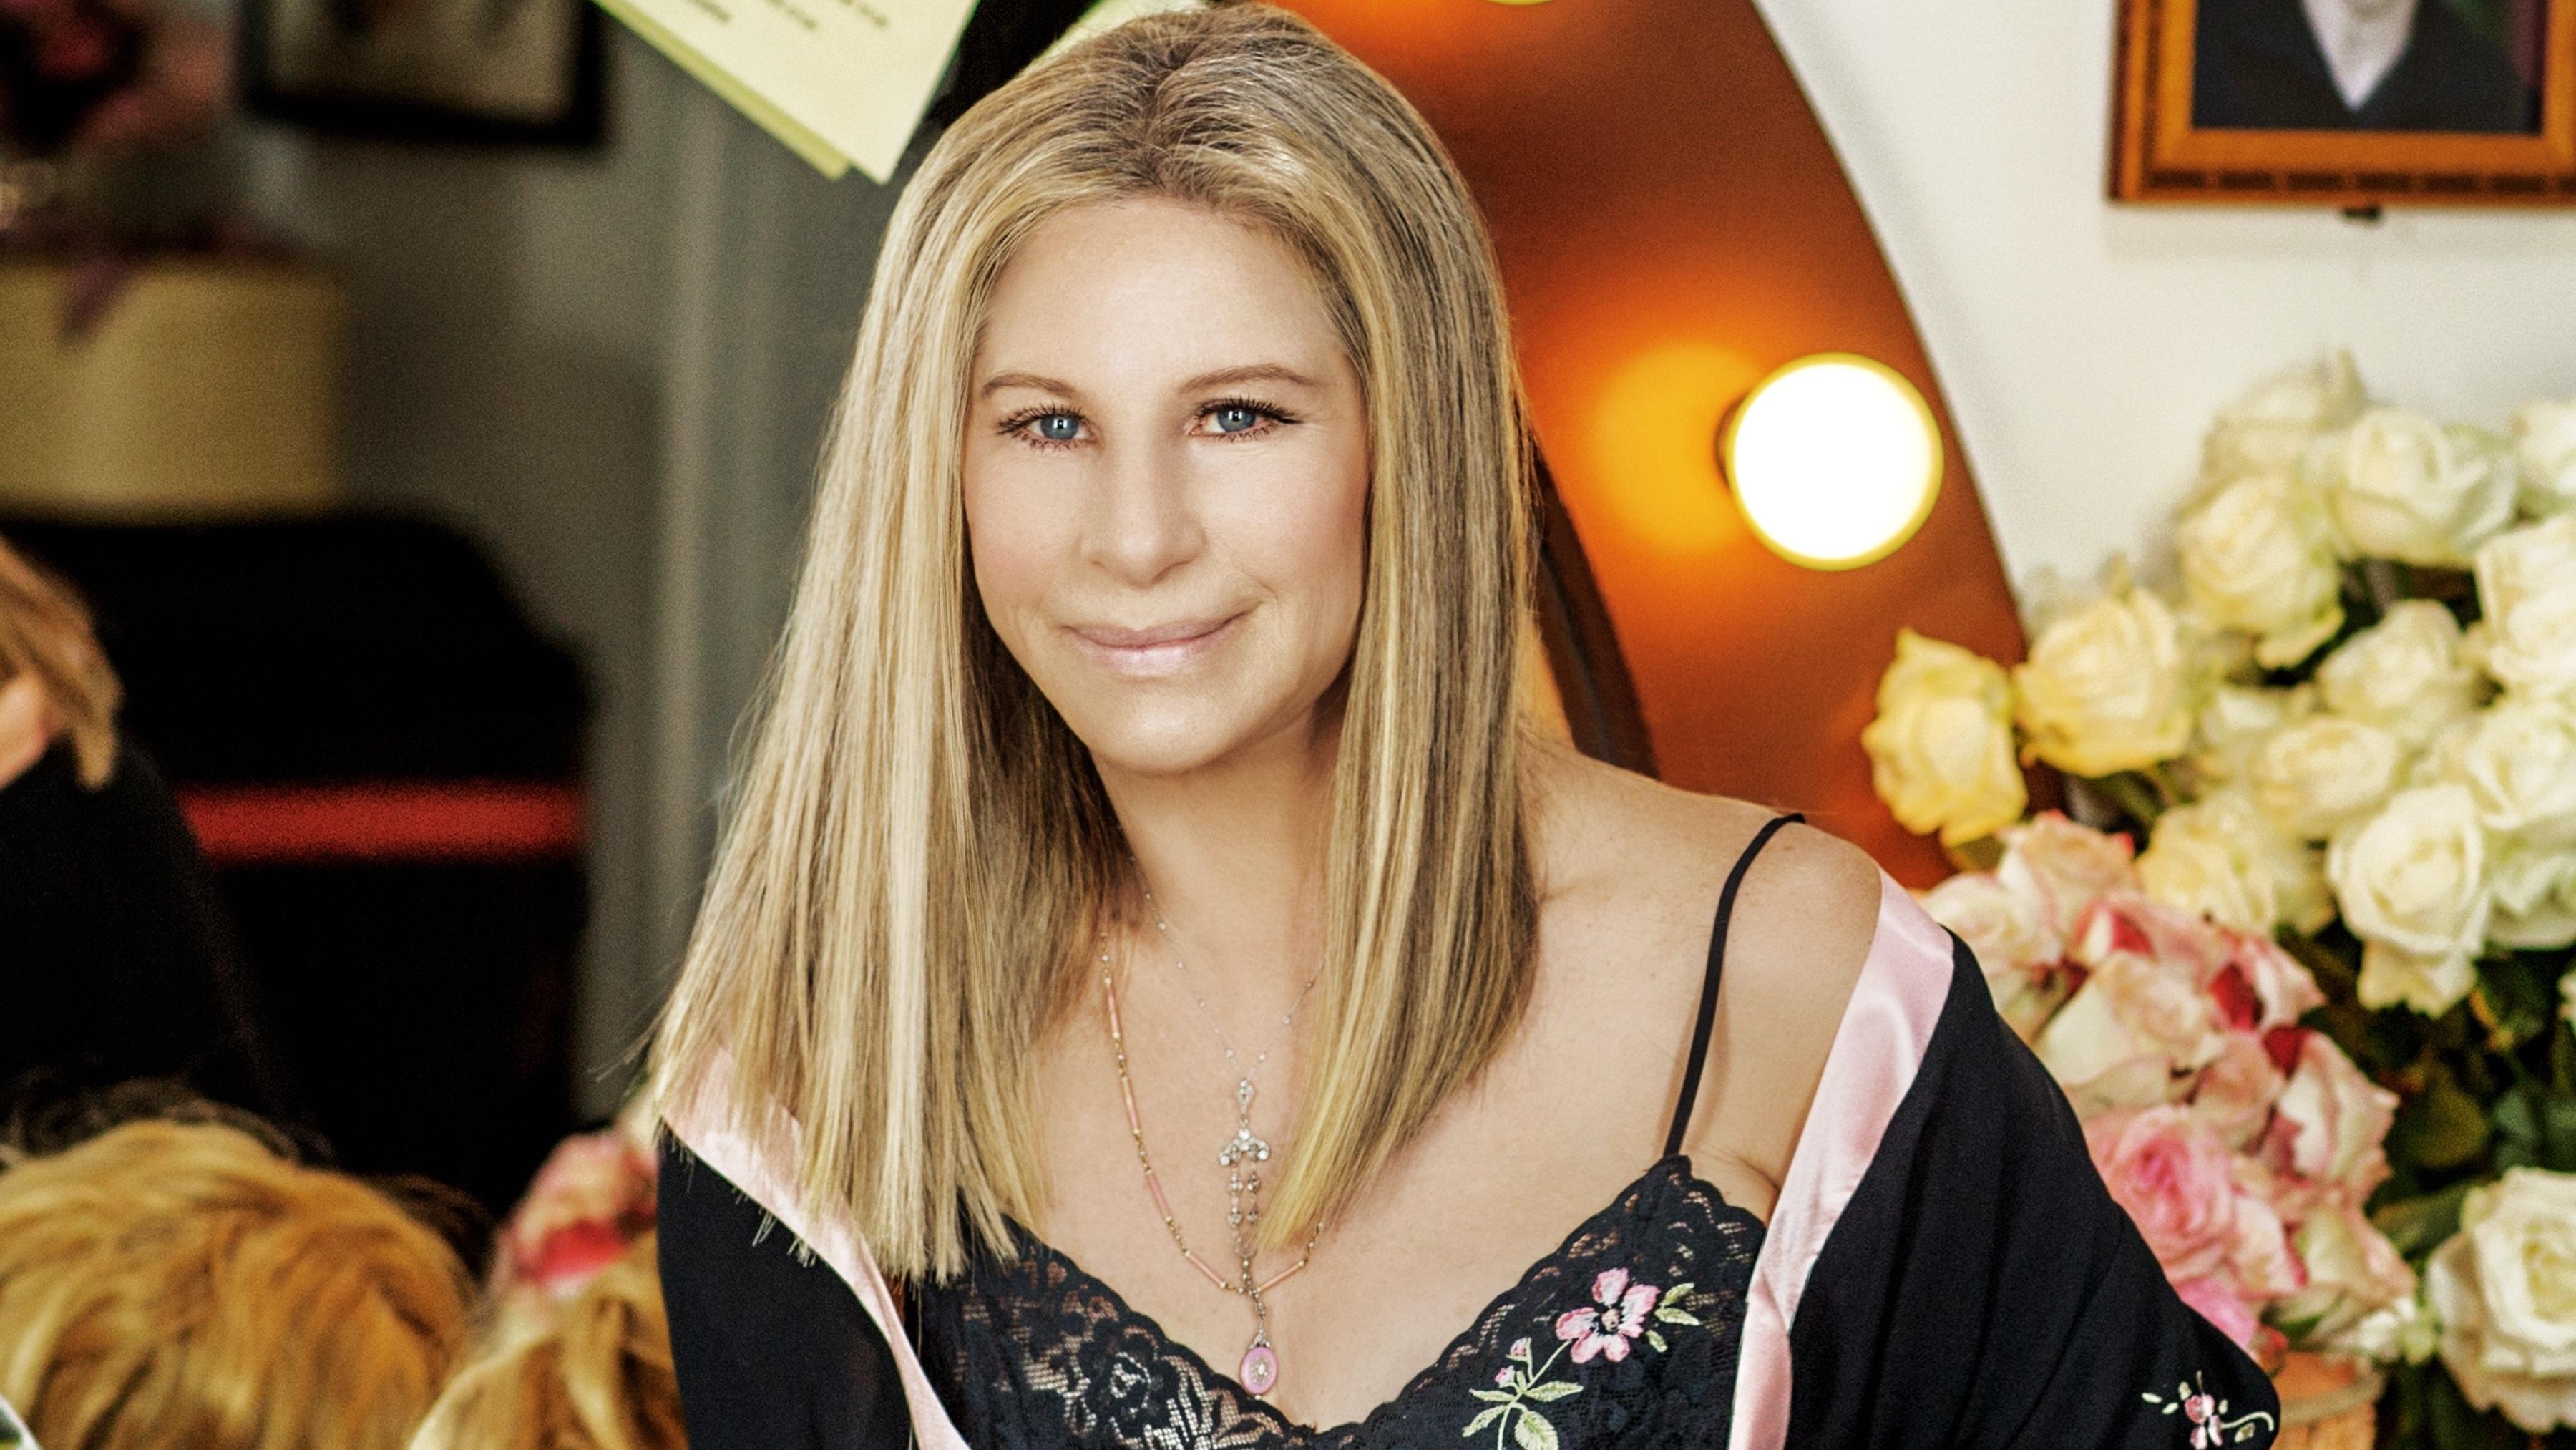 Barbra Streisand On Broadway, Hollywood — And Siri